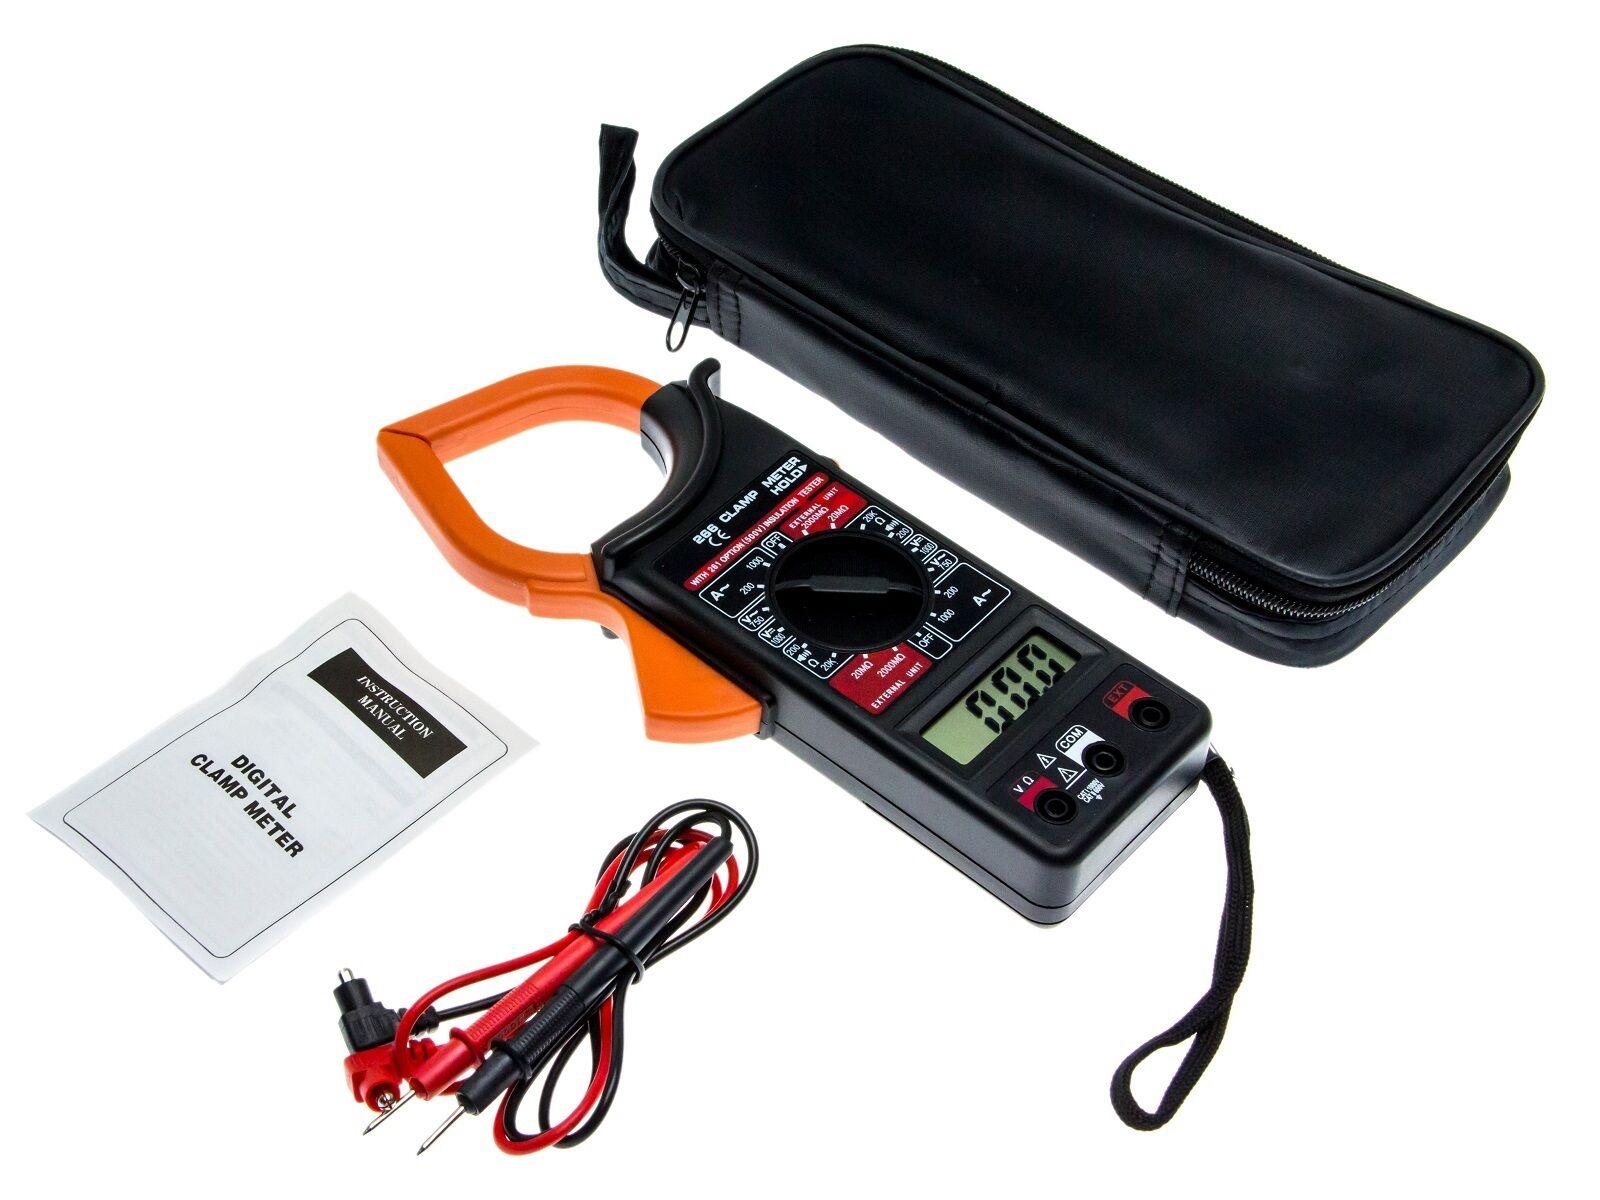 Digital Clamp Meter : Digital pliers multimeter ac to dc clamp meter current